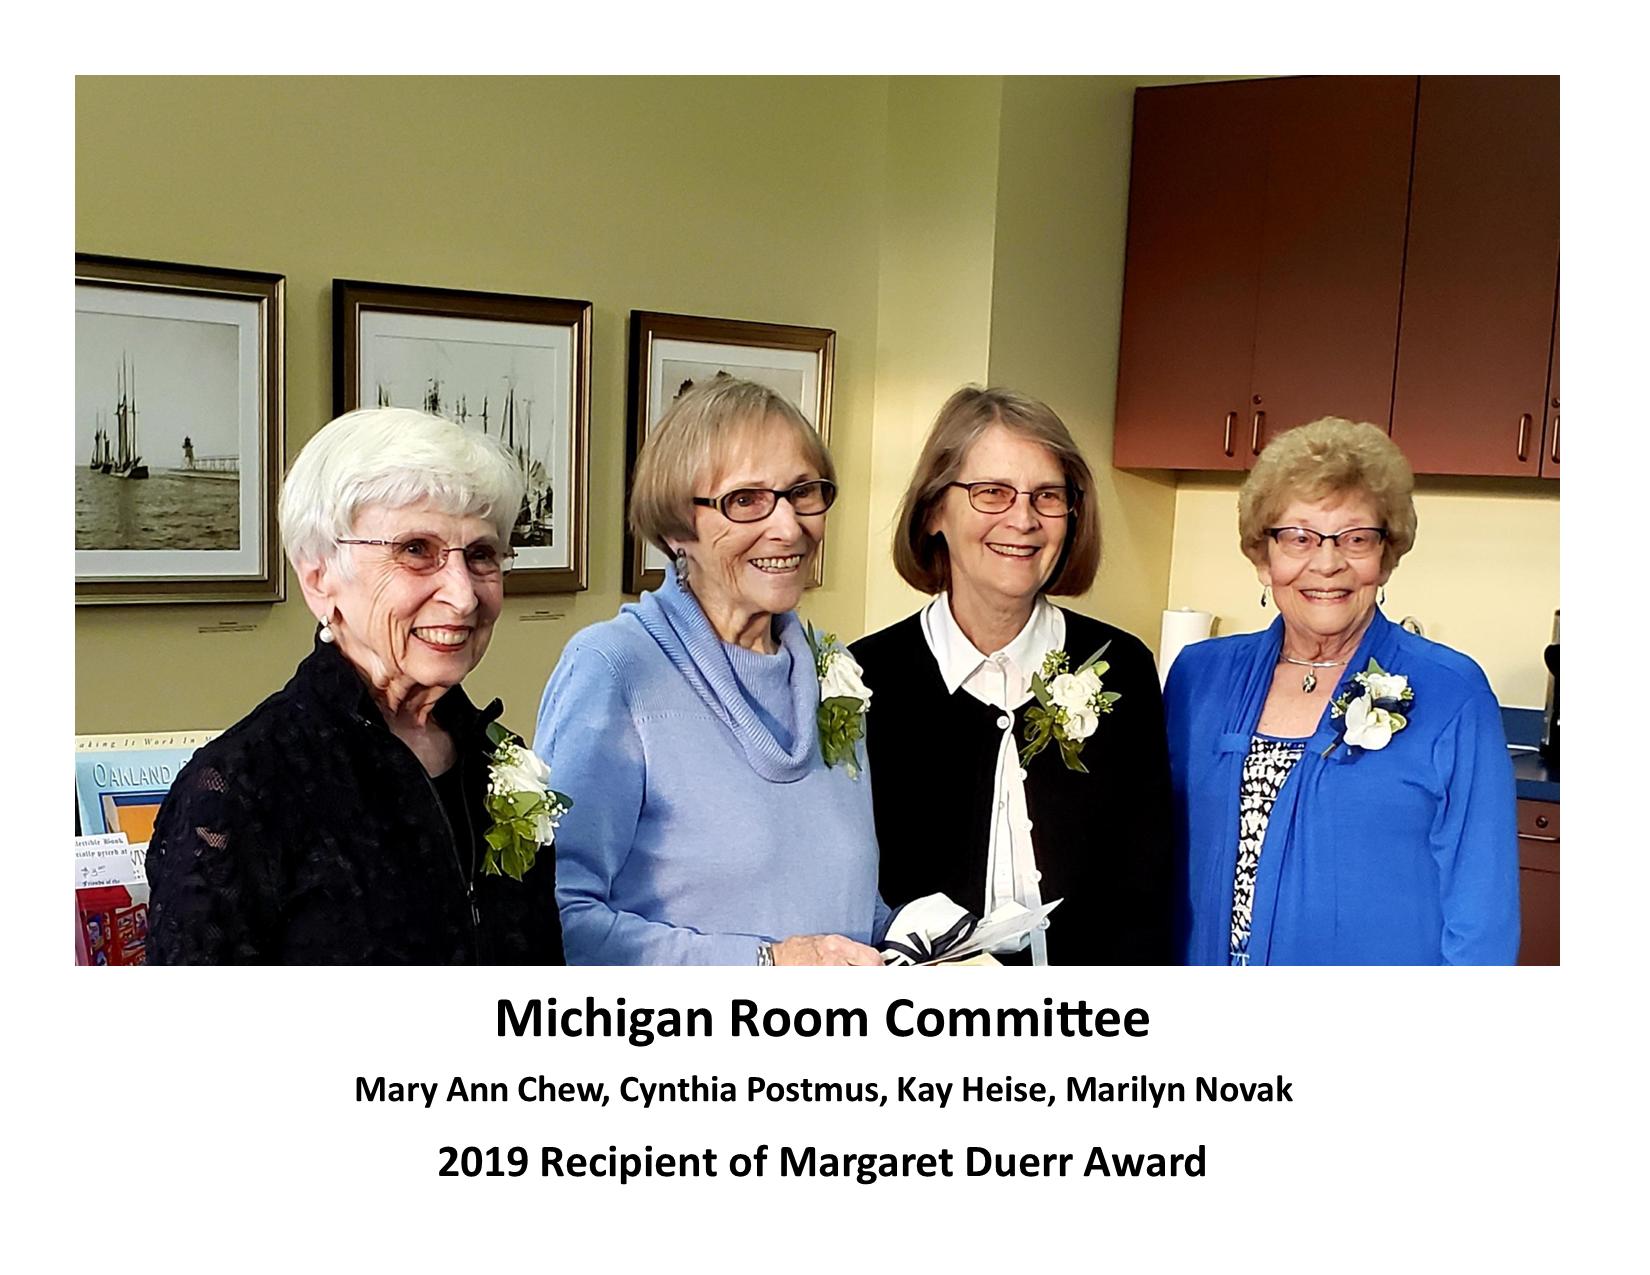 Michigan-Room-Committe-2019-Duerr-Award